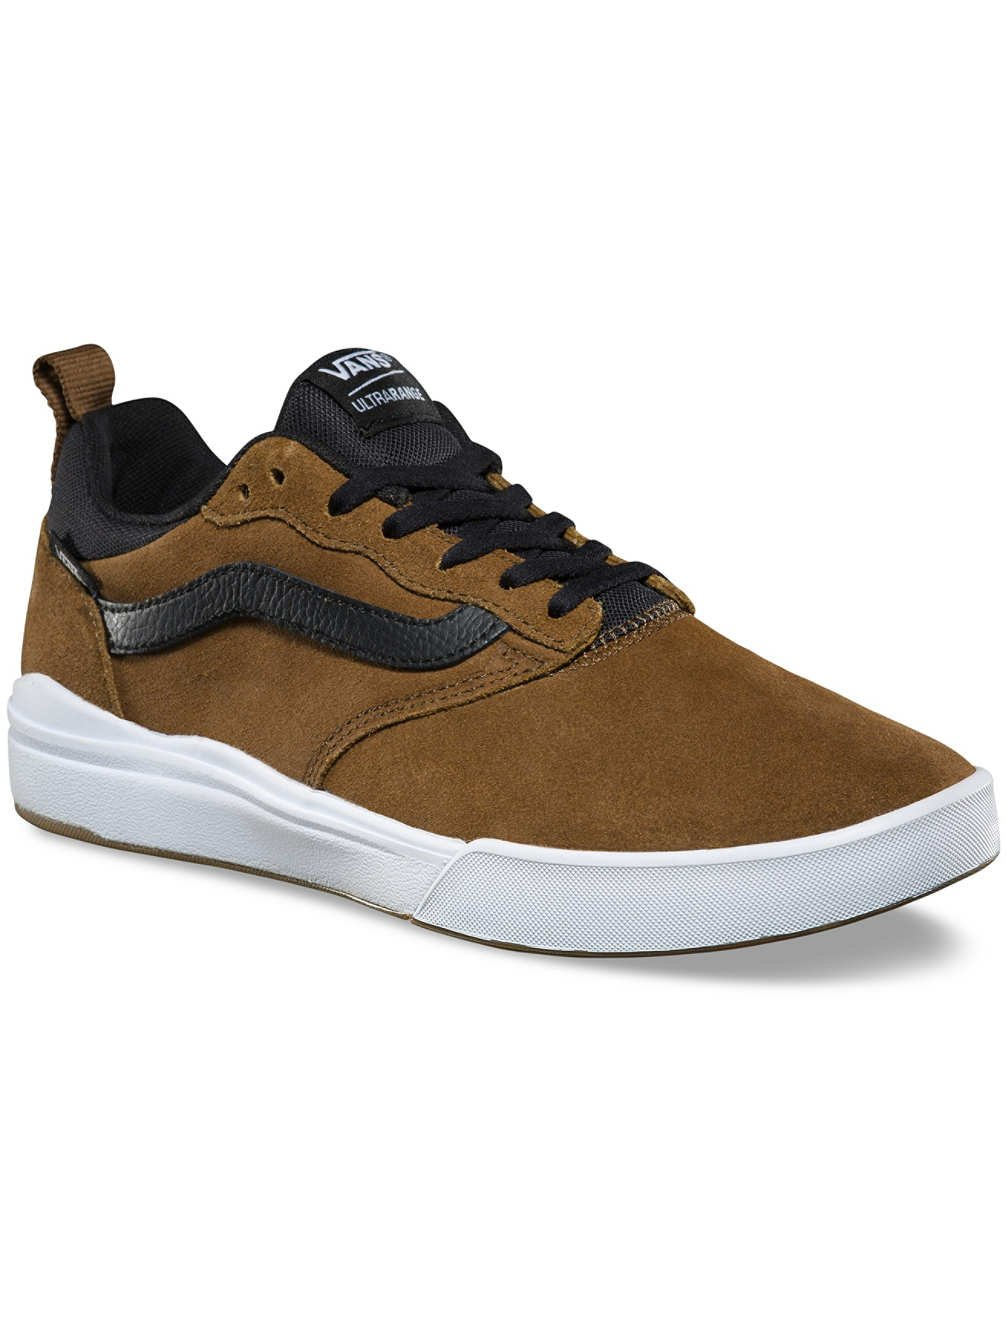 3ce11cdf2e1b65 Galleon - Vans Men s Ultrarange Pro Skate Shoe (Teak Black White